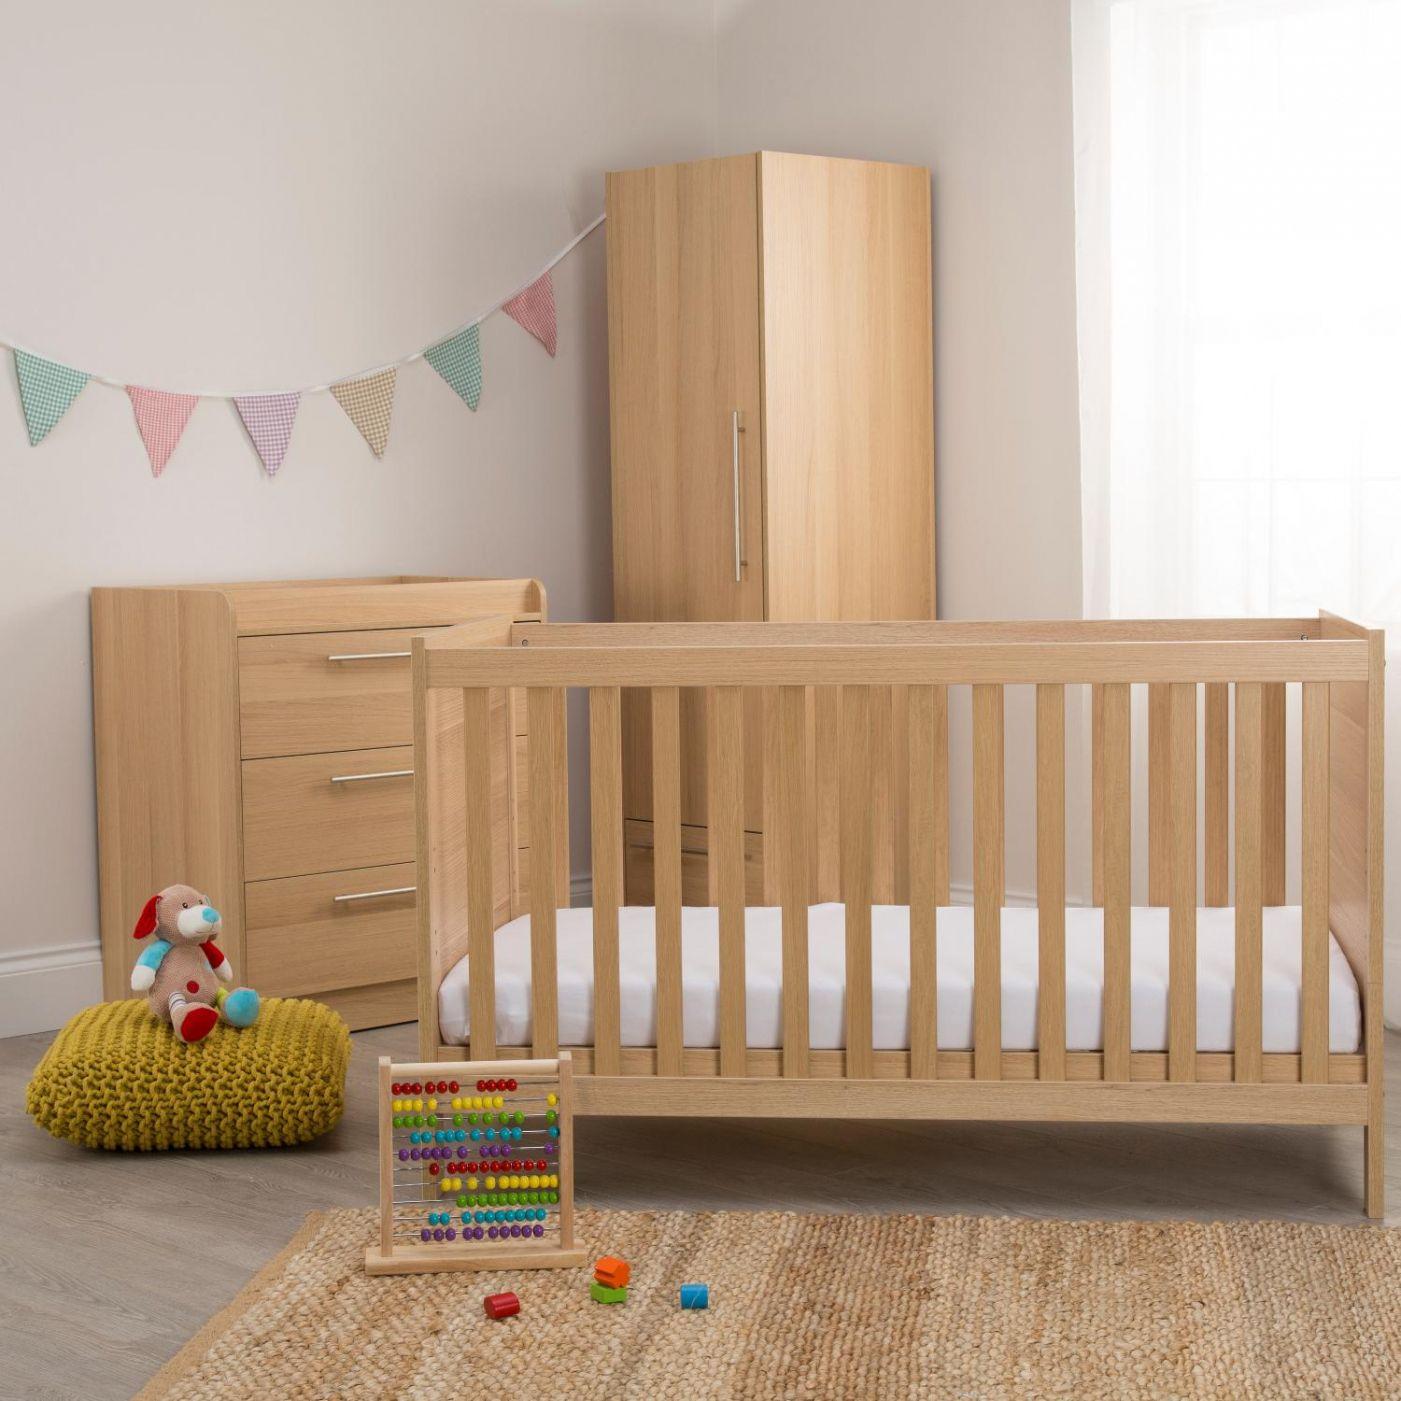 30 Oak Baby Furniture Sets Interior Design Bedroom Color Schemes Check More At Http